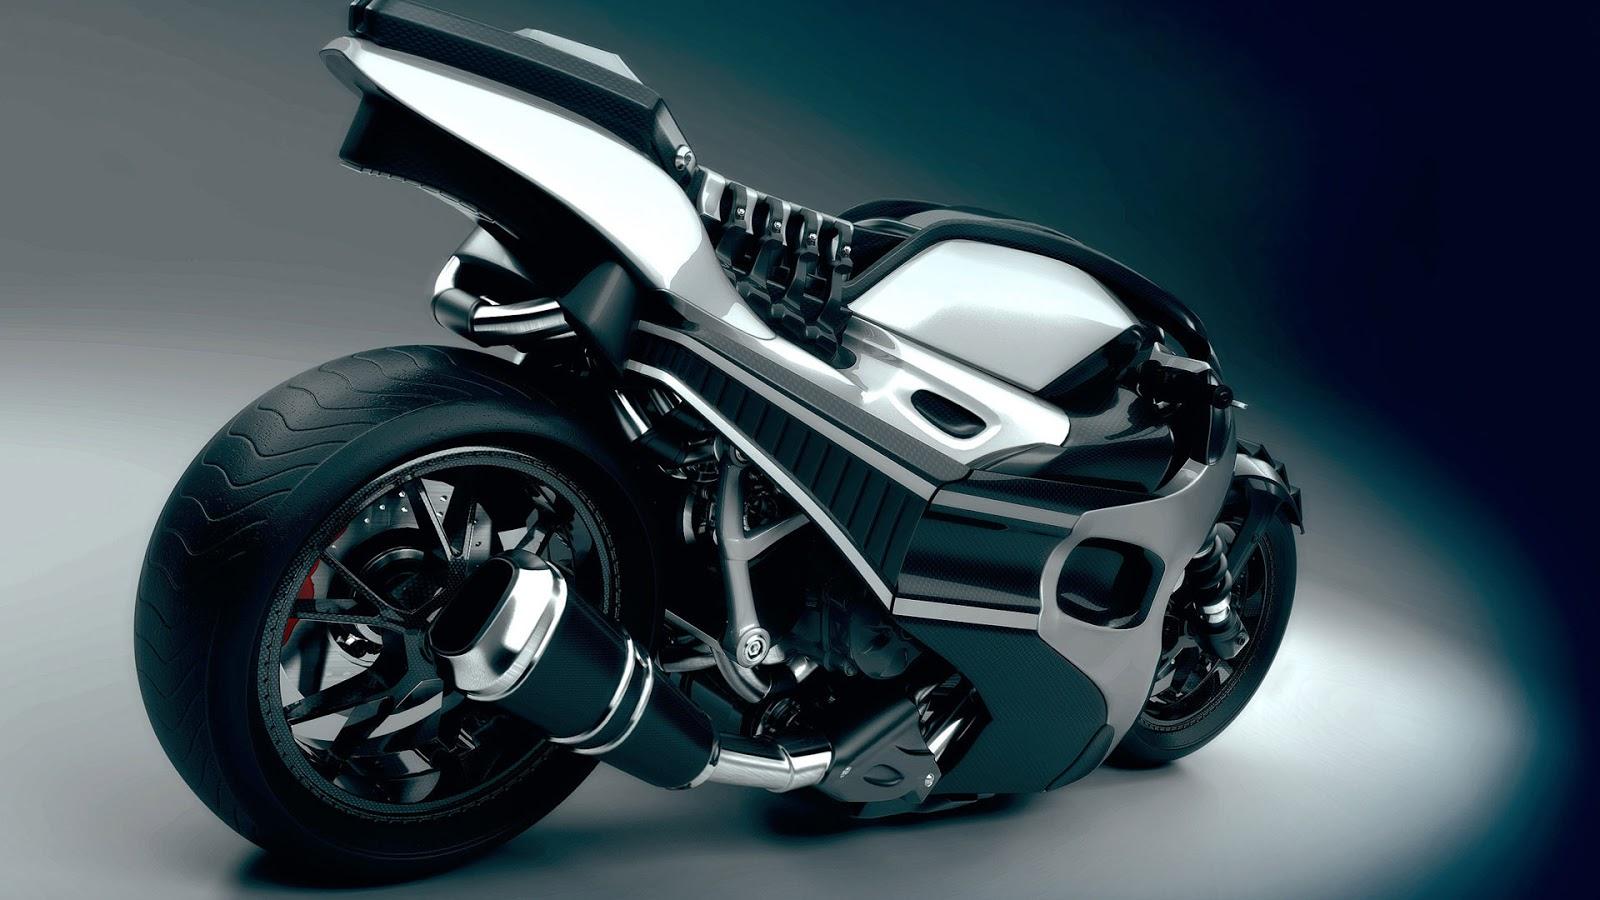 Indian Sports Bikes,Bmw Sports Bike,Yamaha Sports Bikes